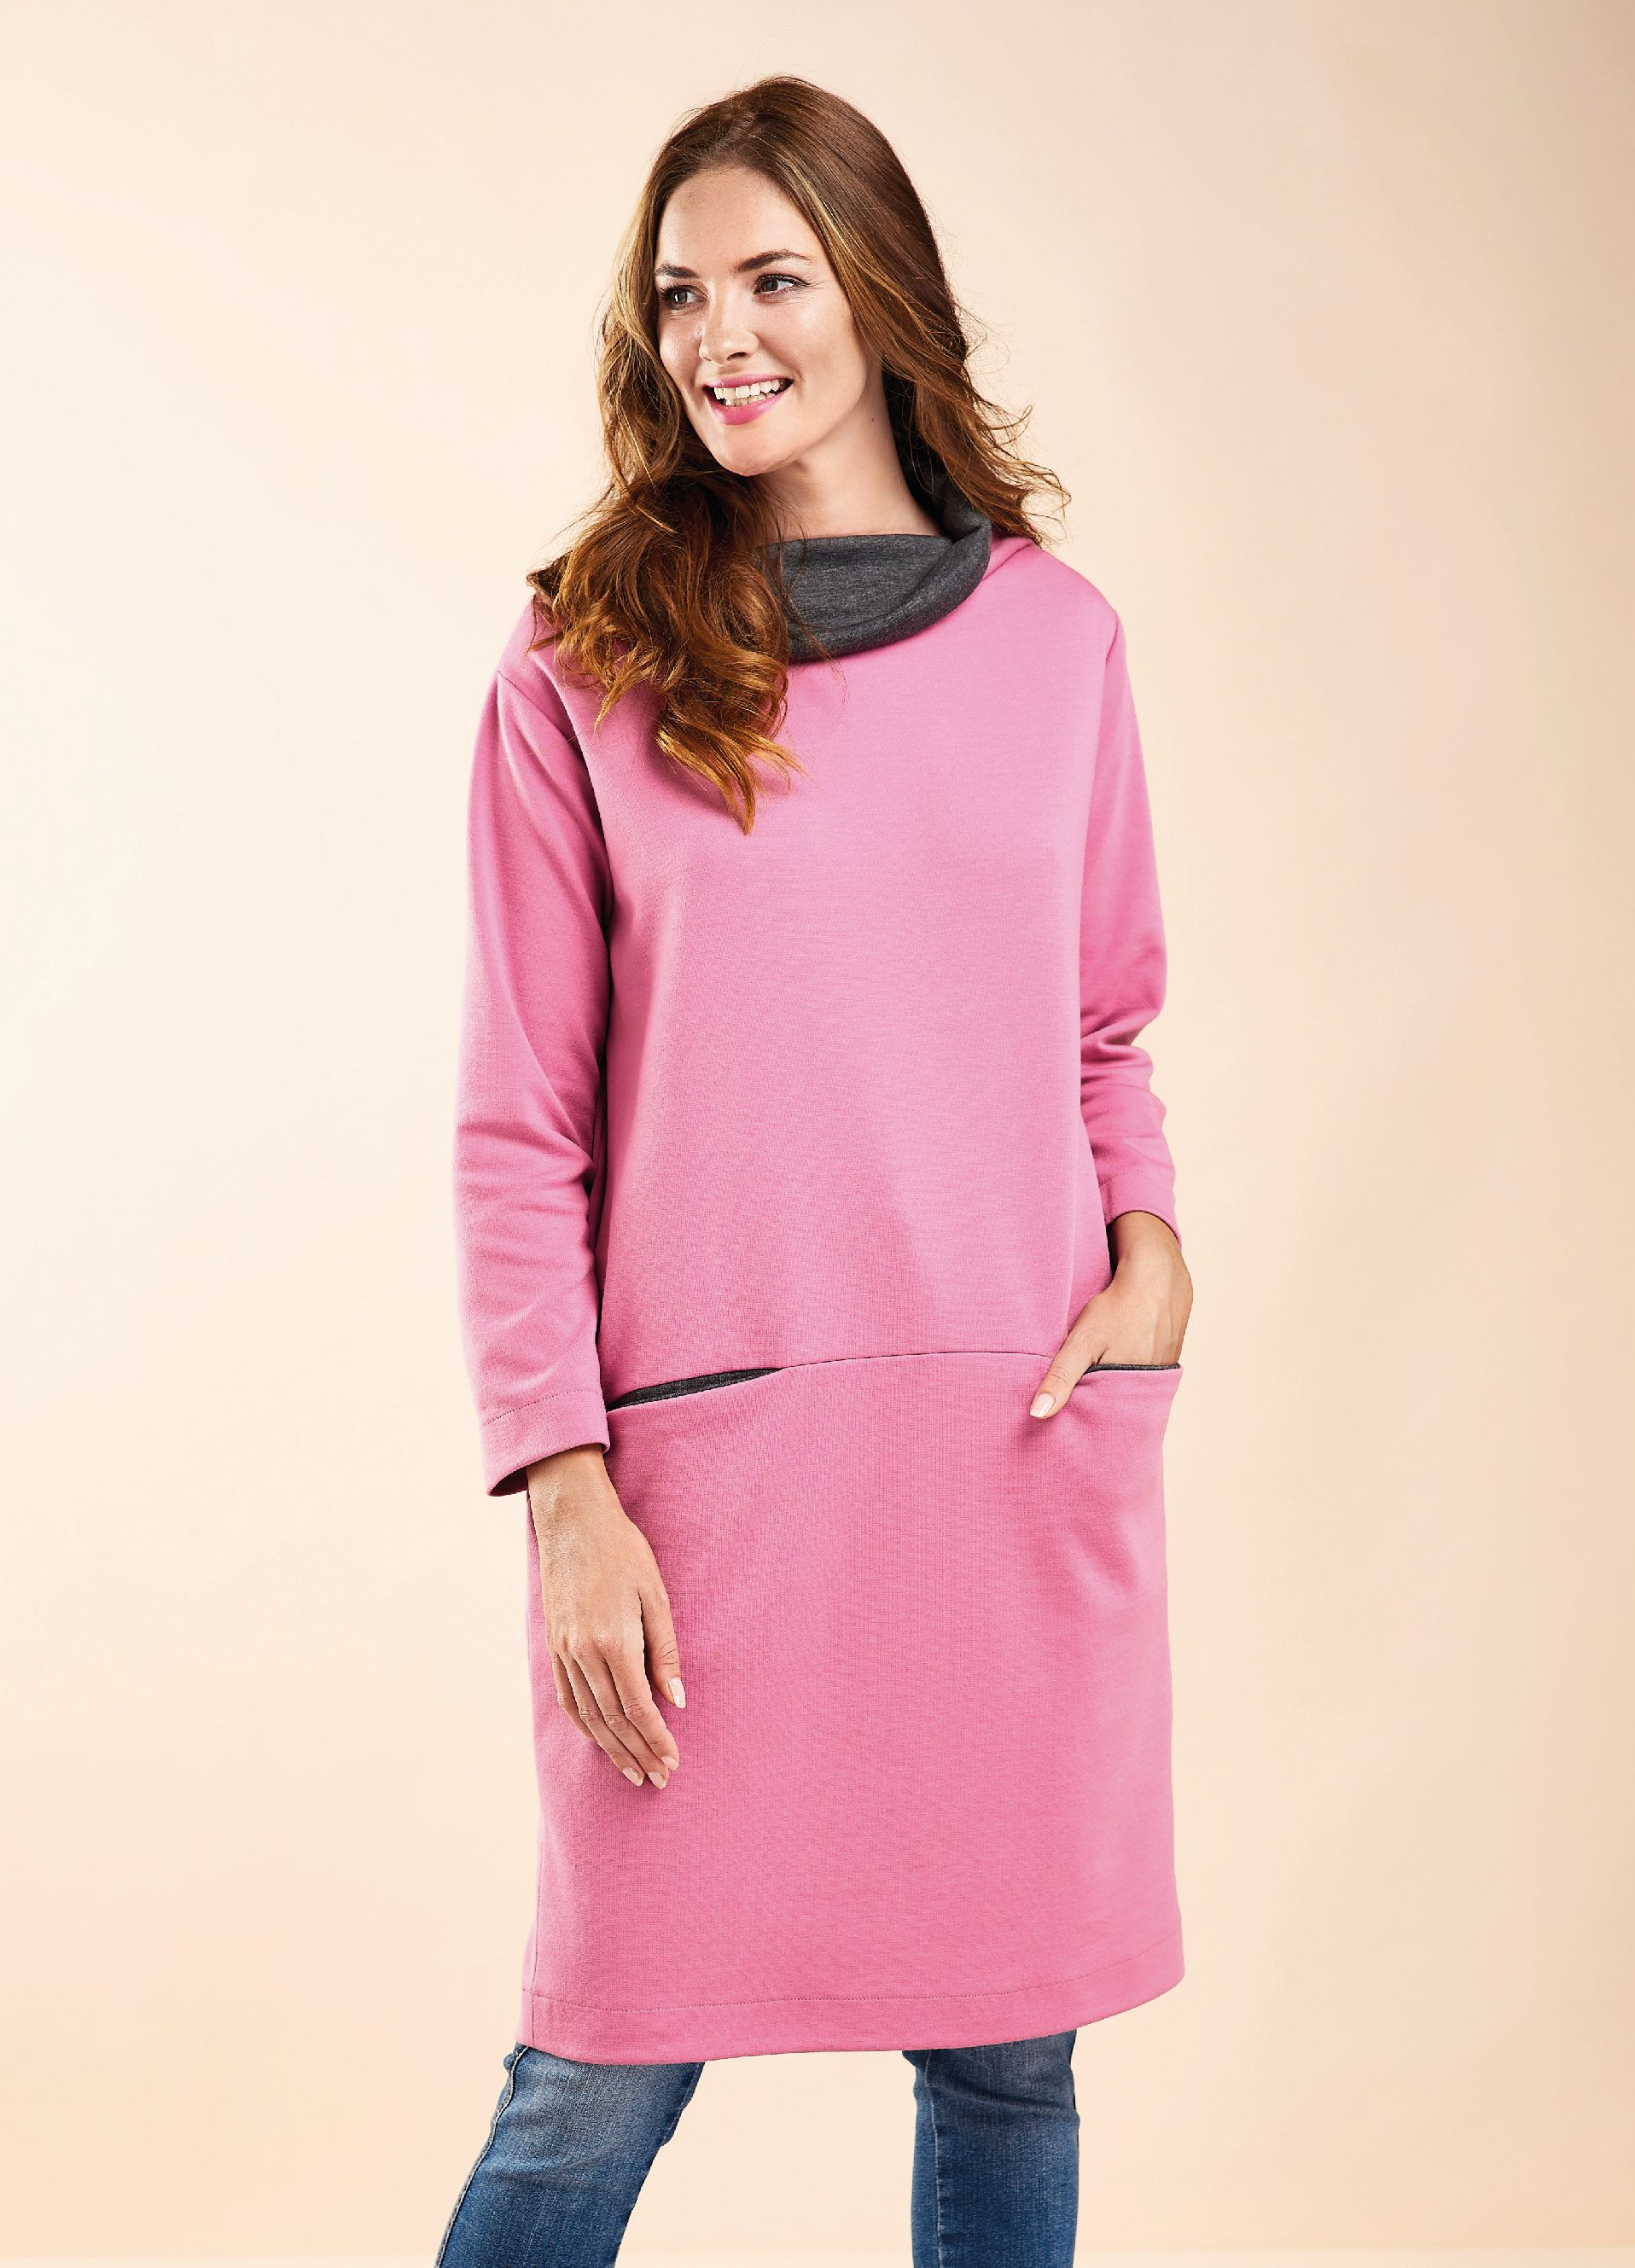 Josie Tunic Free Sewing Patterns Sew Magazine